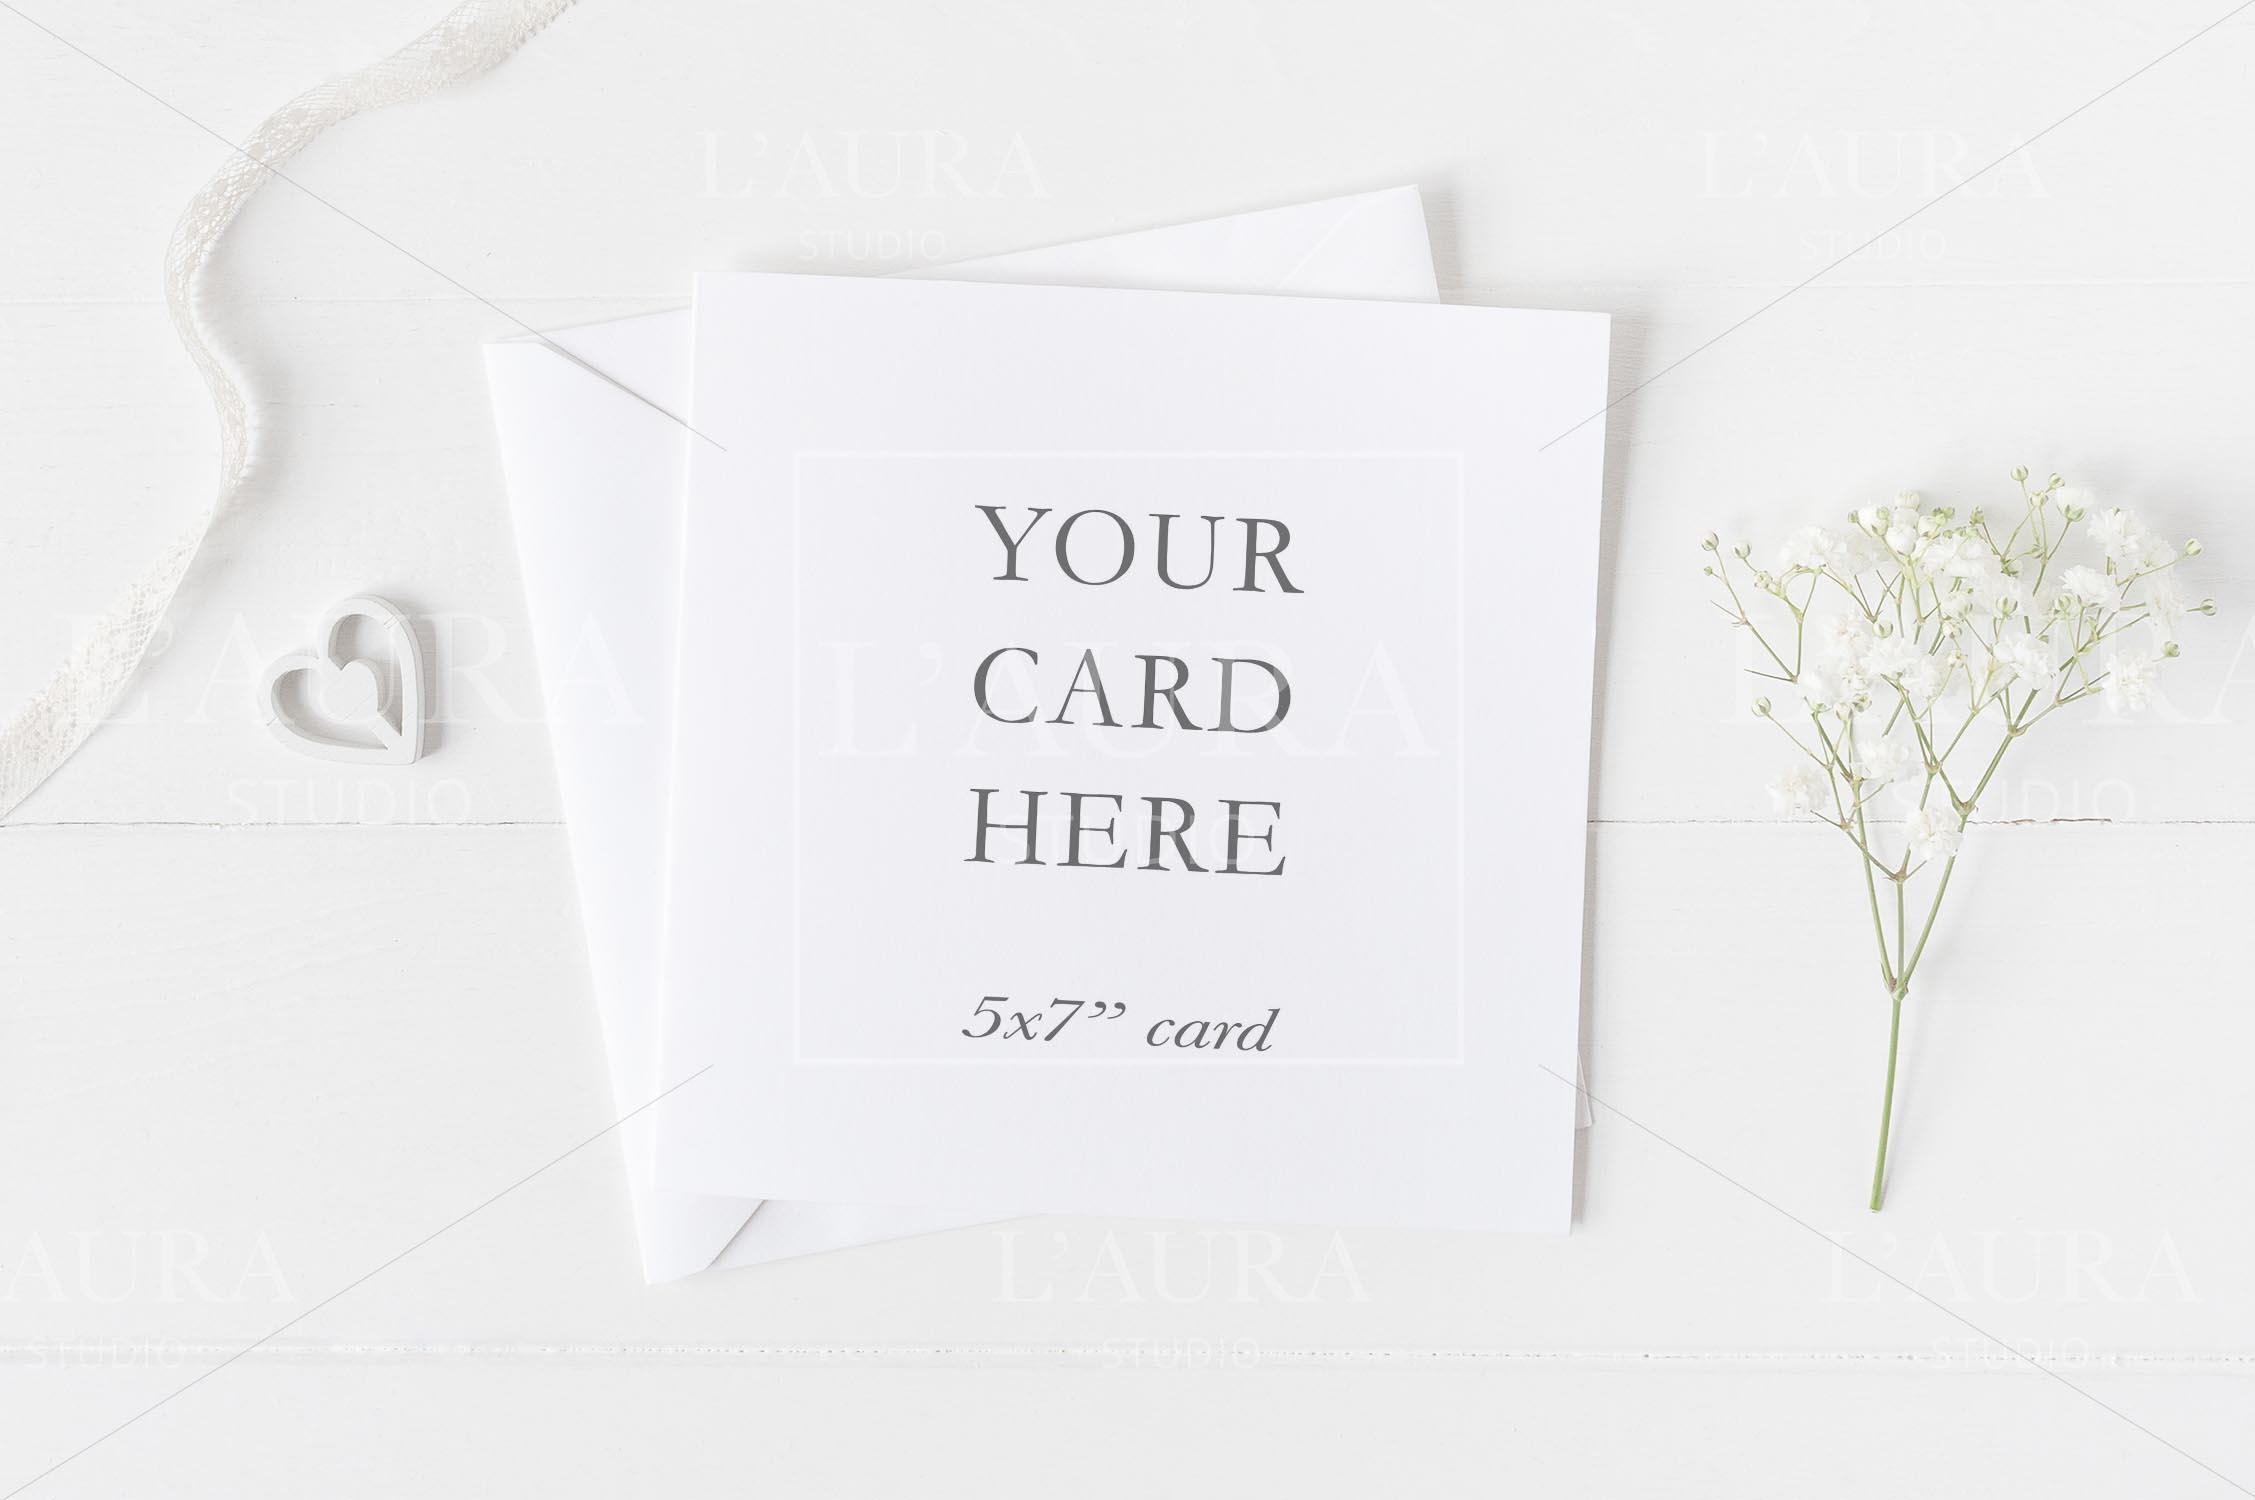 Wedding Square Card Mockup - crd231 example image 1